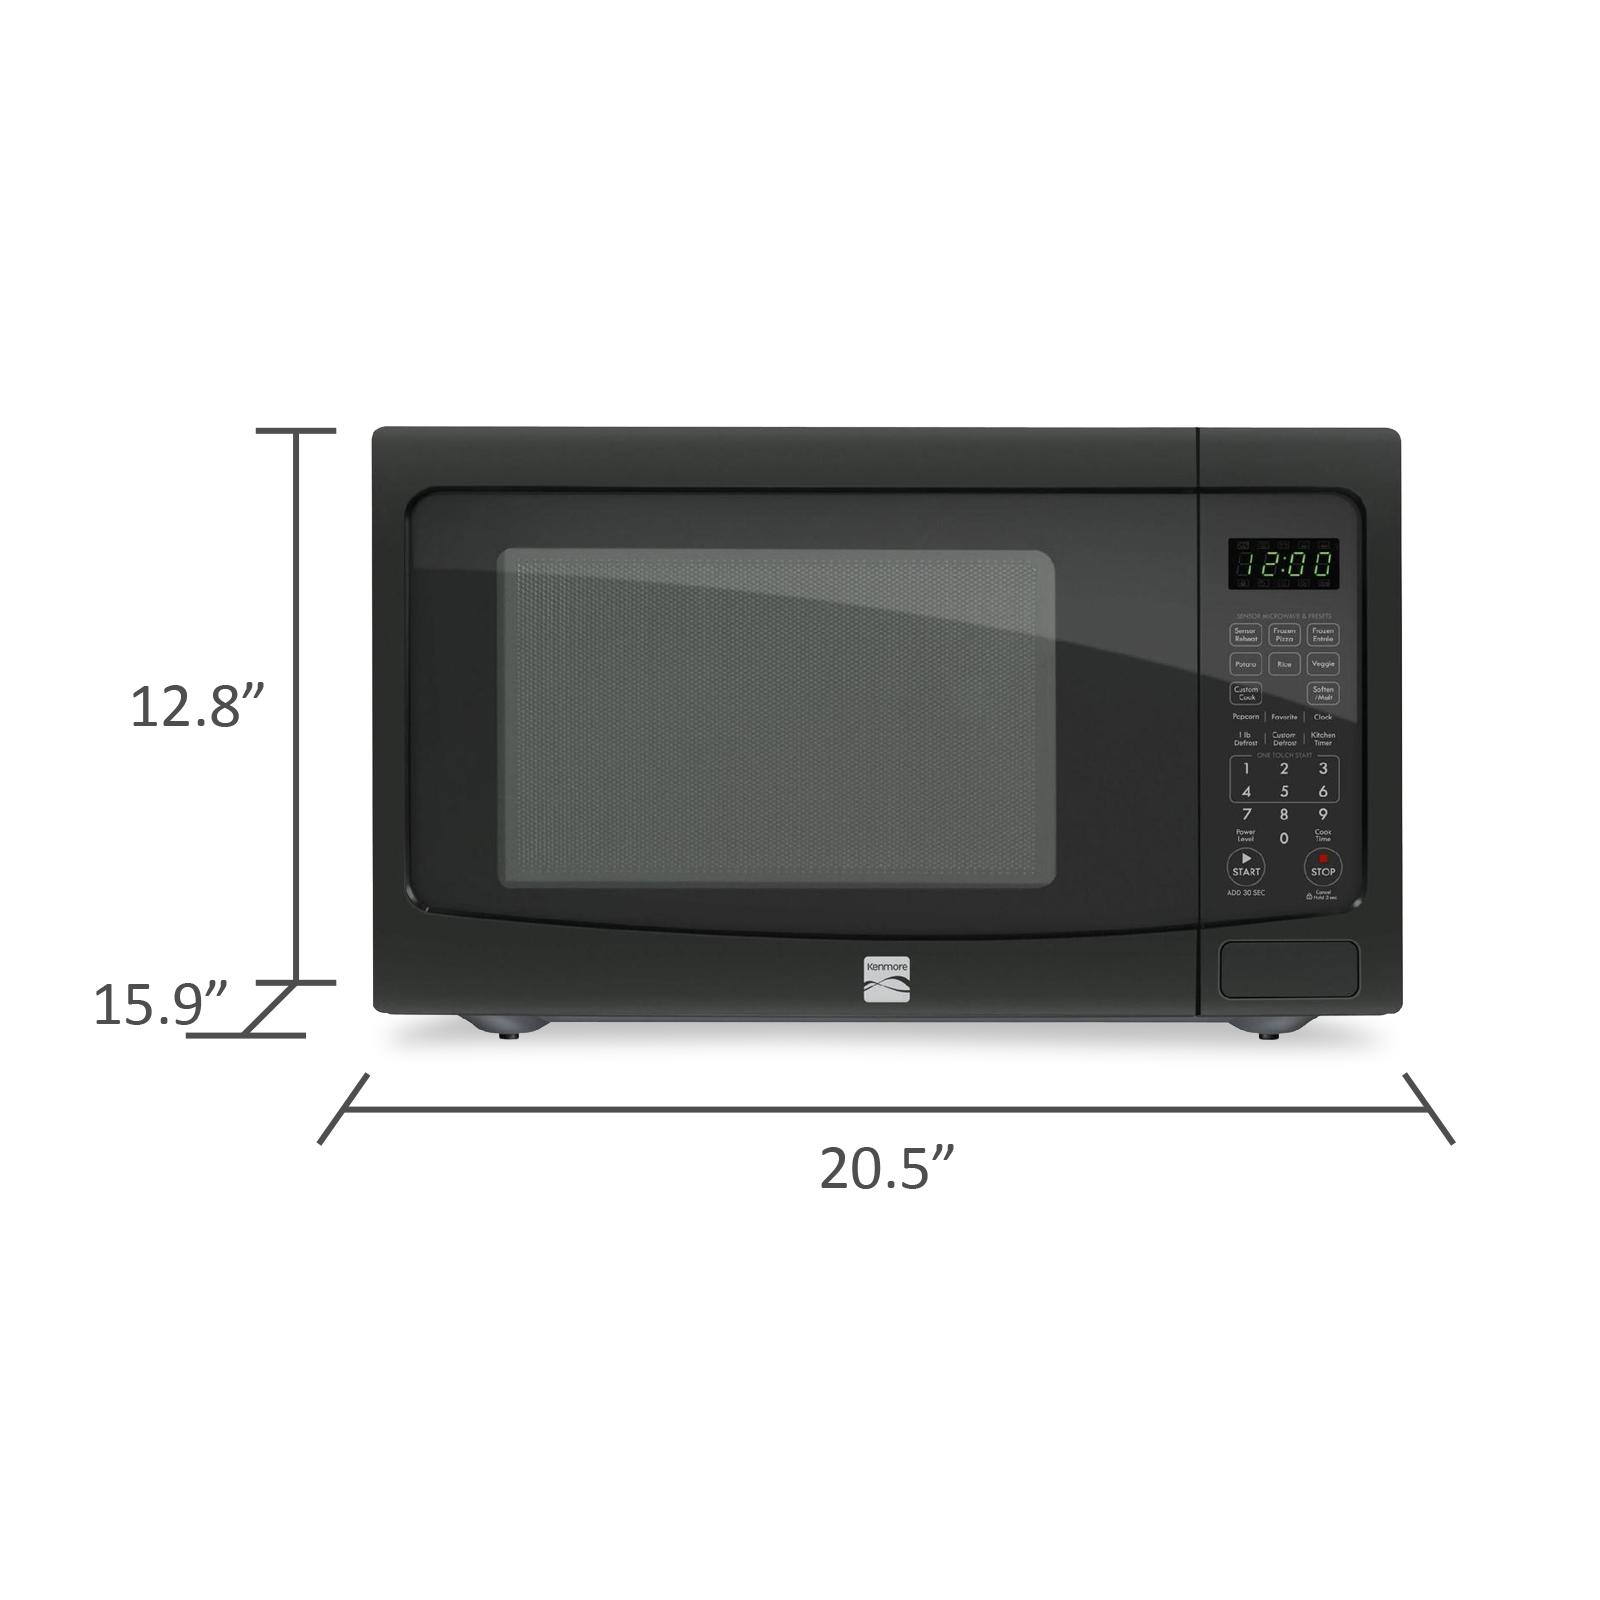 Kenmore 72129 1.2 cu. ft. Countertop Microwave w/ EZ Clean Interior - Black